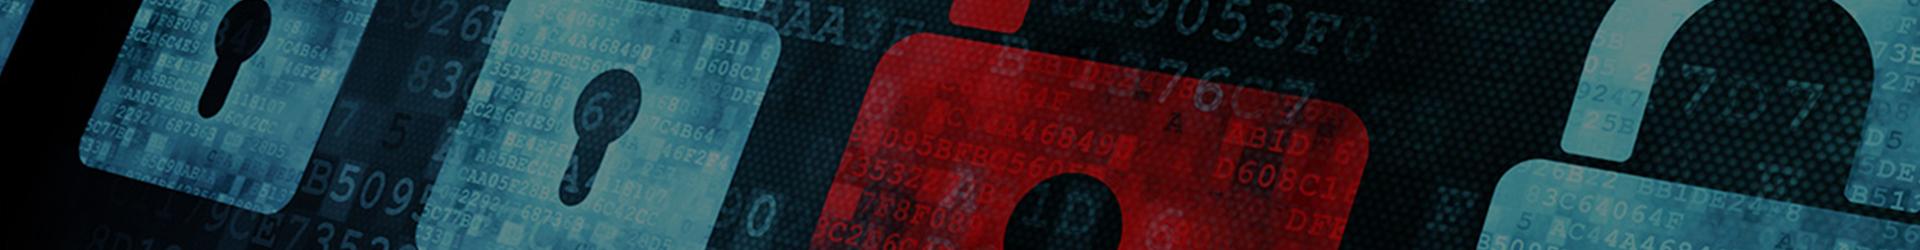 securite informatique pau, antivirus pau, nettoyage ordinateur pau